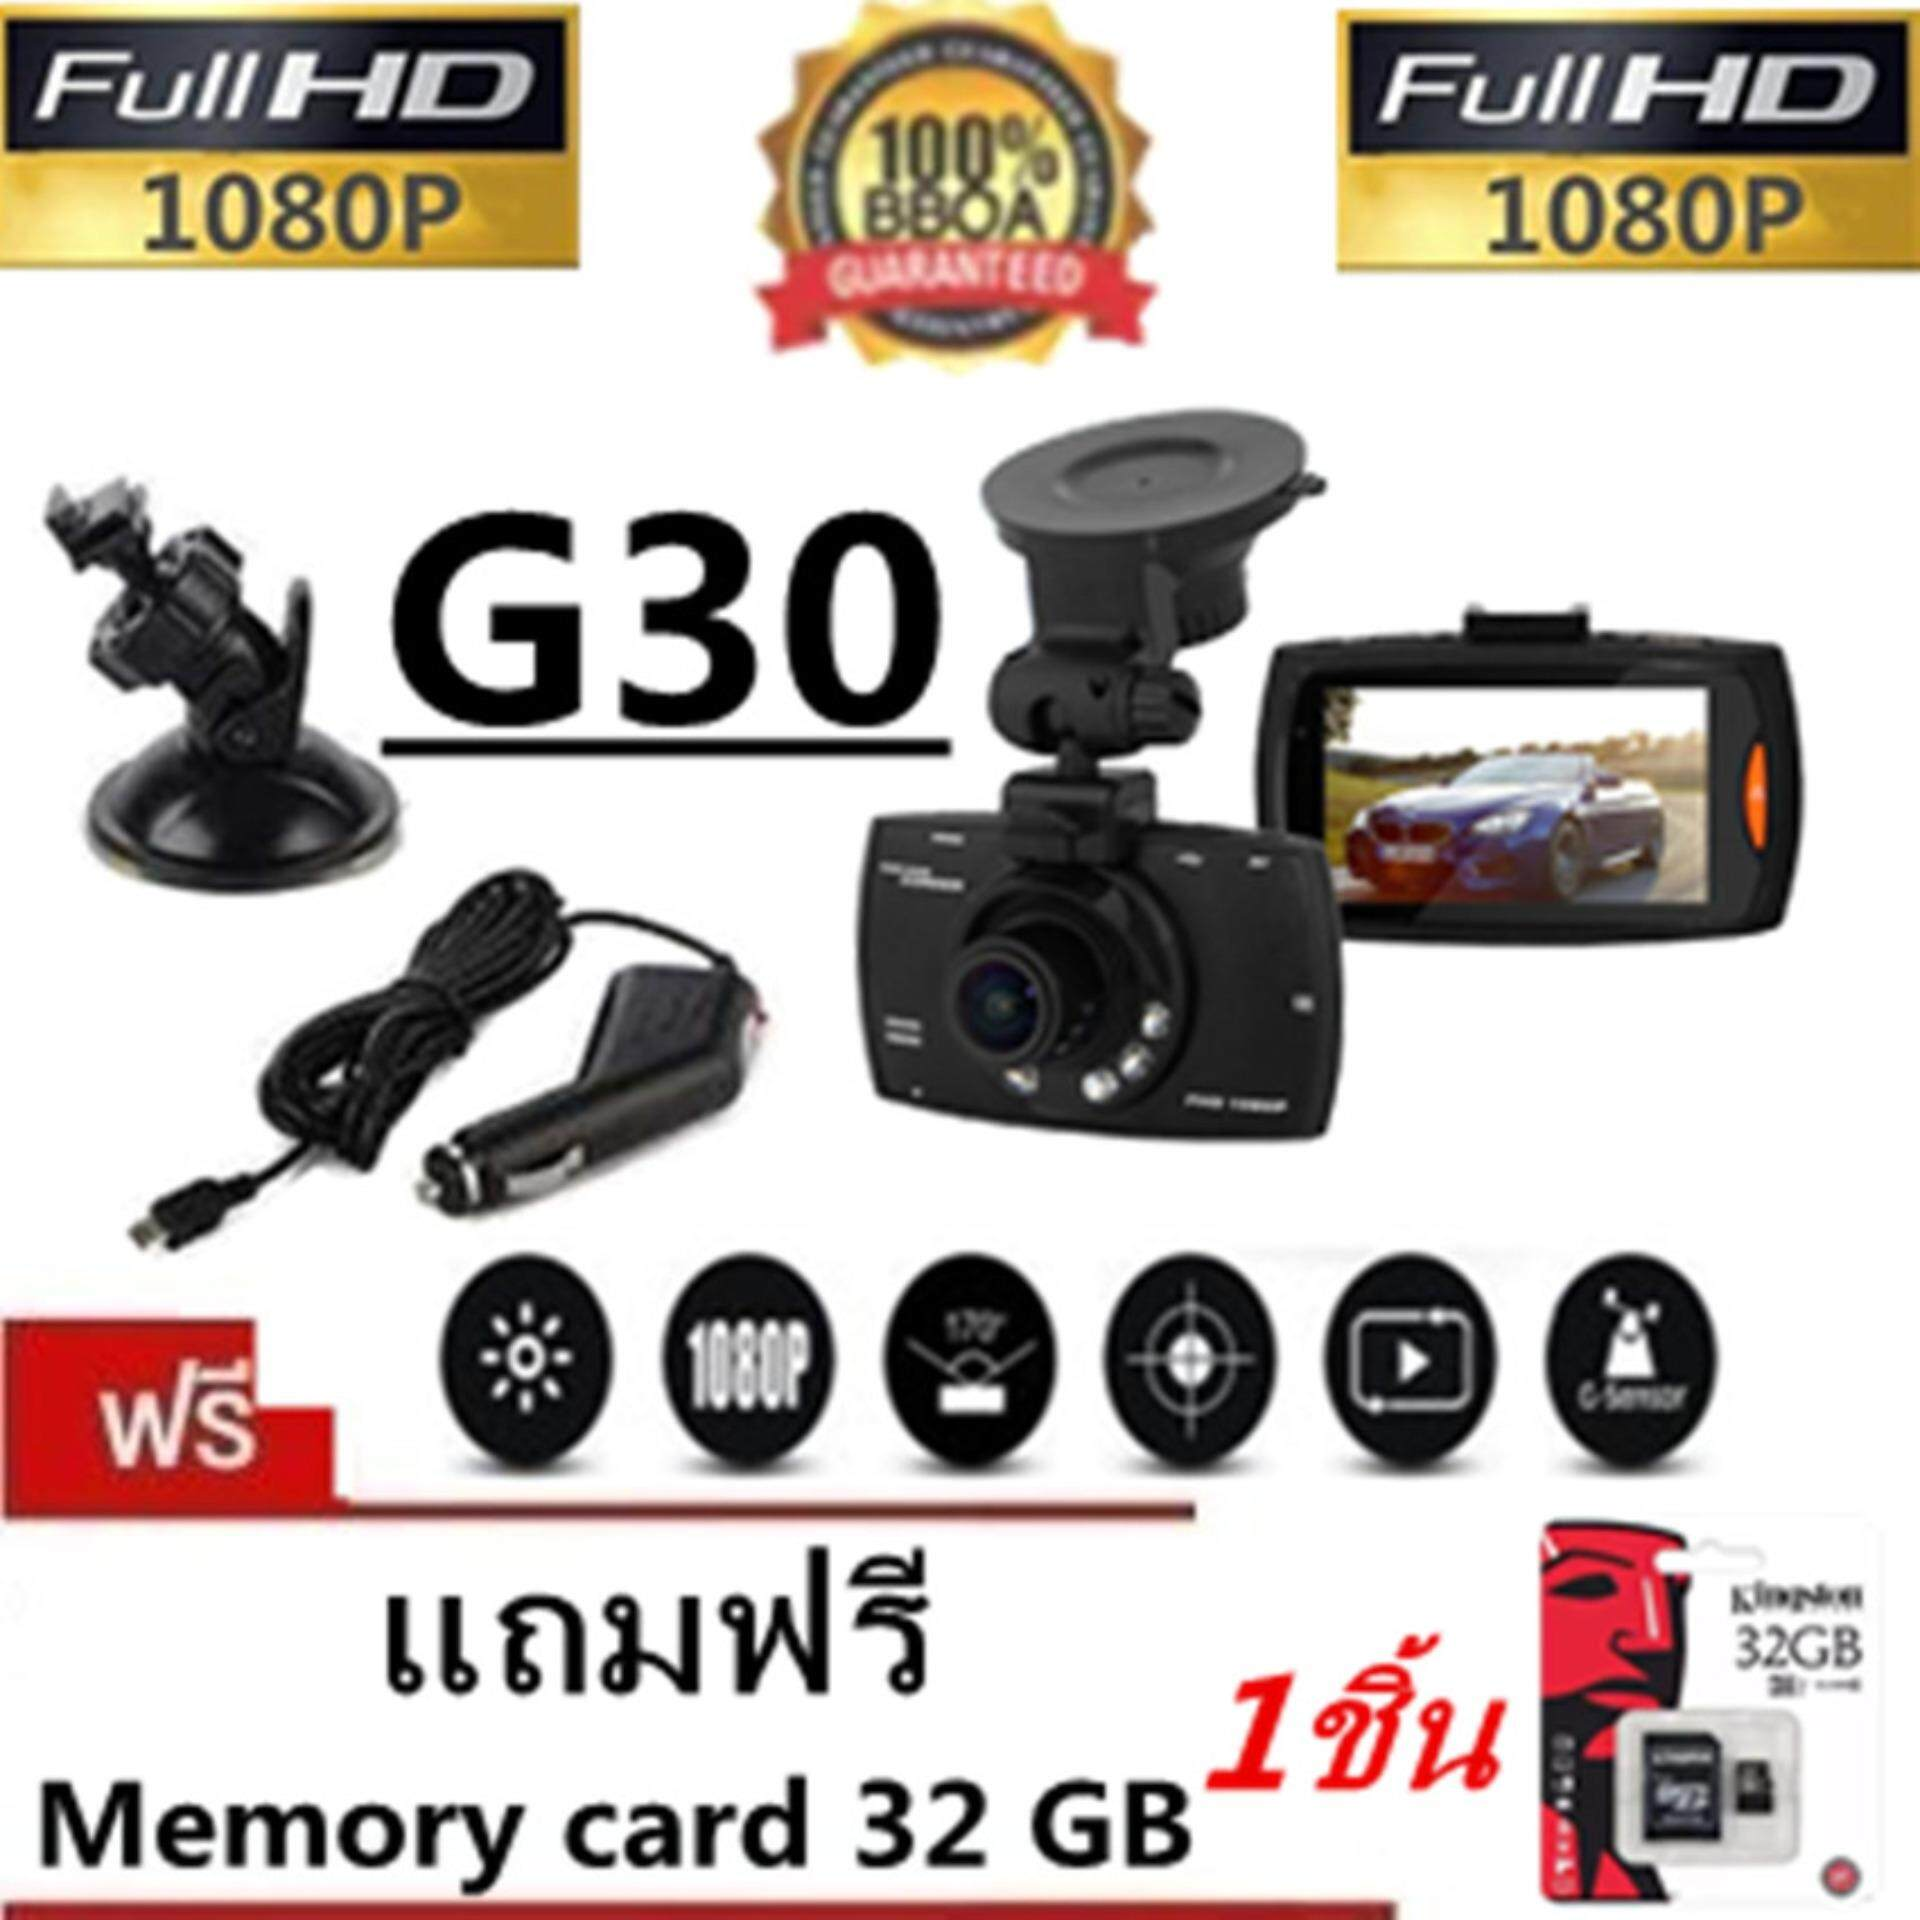 Camera Car Cameras กล้องติดรถยนต์ รุ่น G30 C (black) แถมฟรี Memory card 32 GB 1ชิ้น